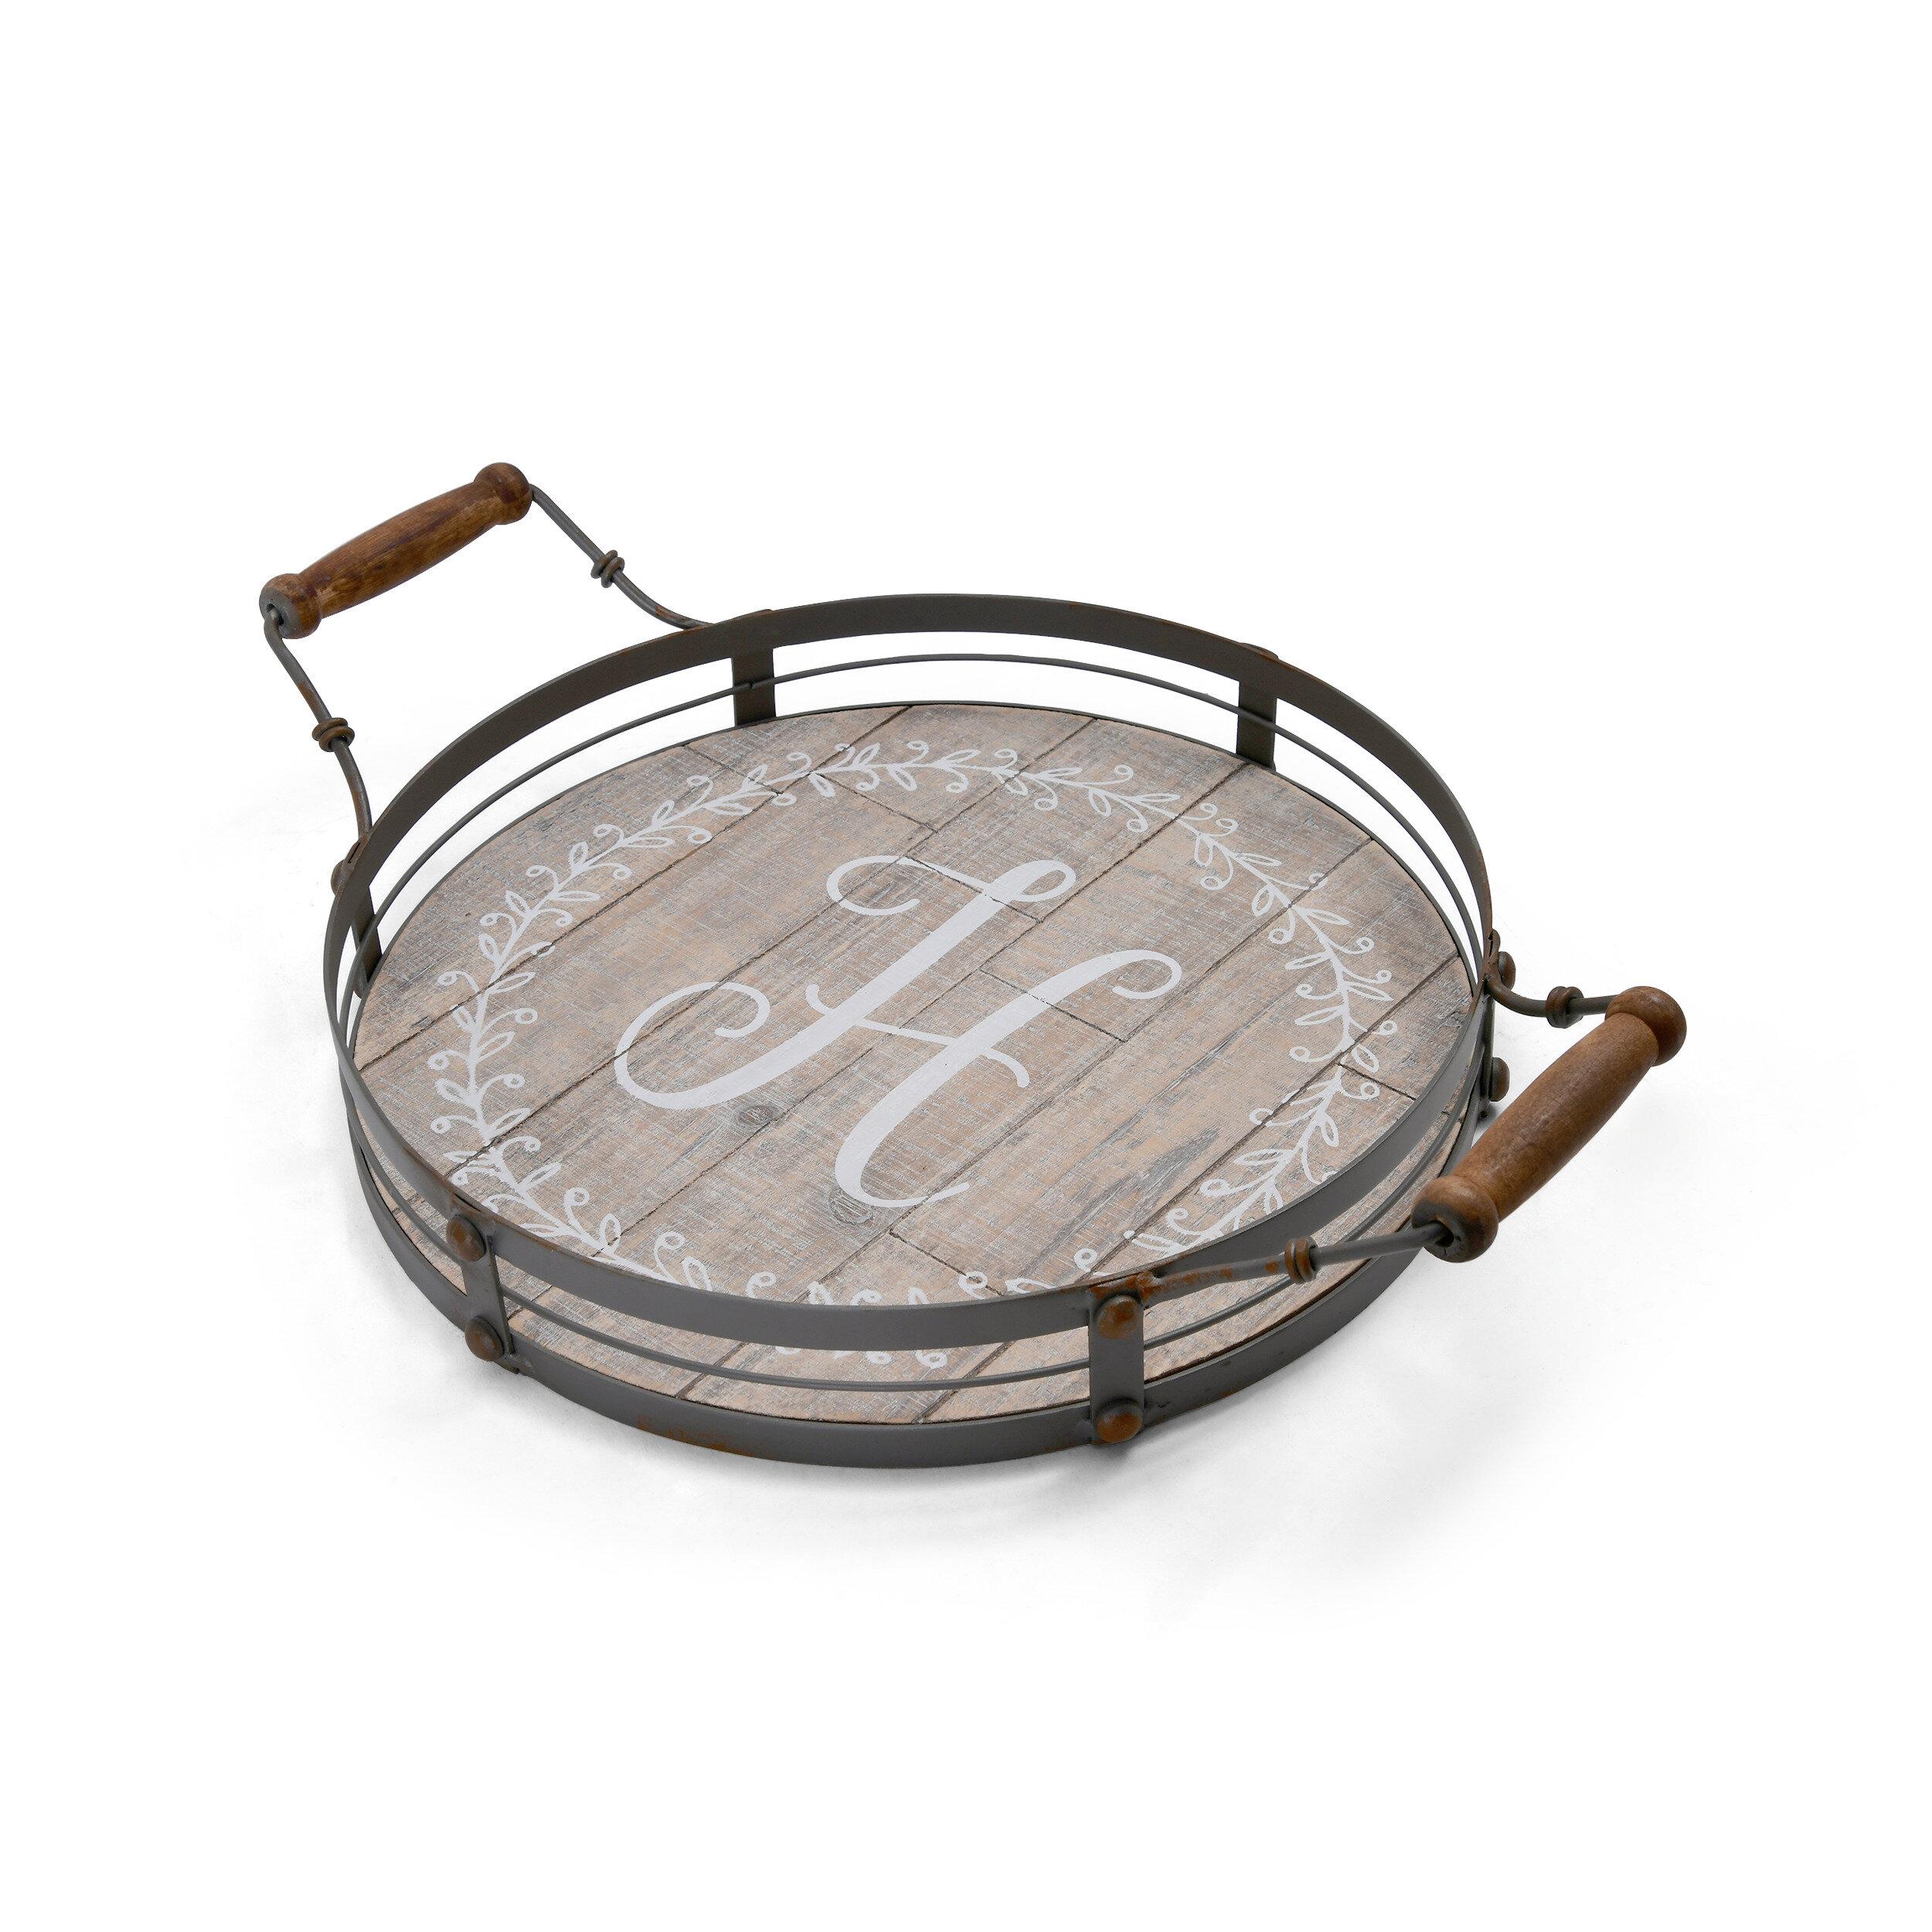 Outstanding Nakita Round H Monogram Metal Accent Ottoman Tray Inzonedesignstudio Interior Chair Design Inzonedesignstudiocom